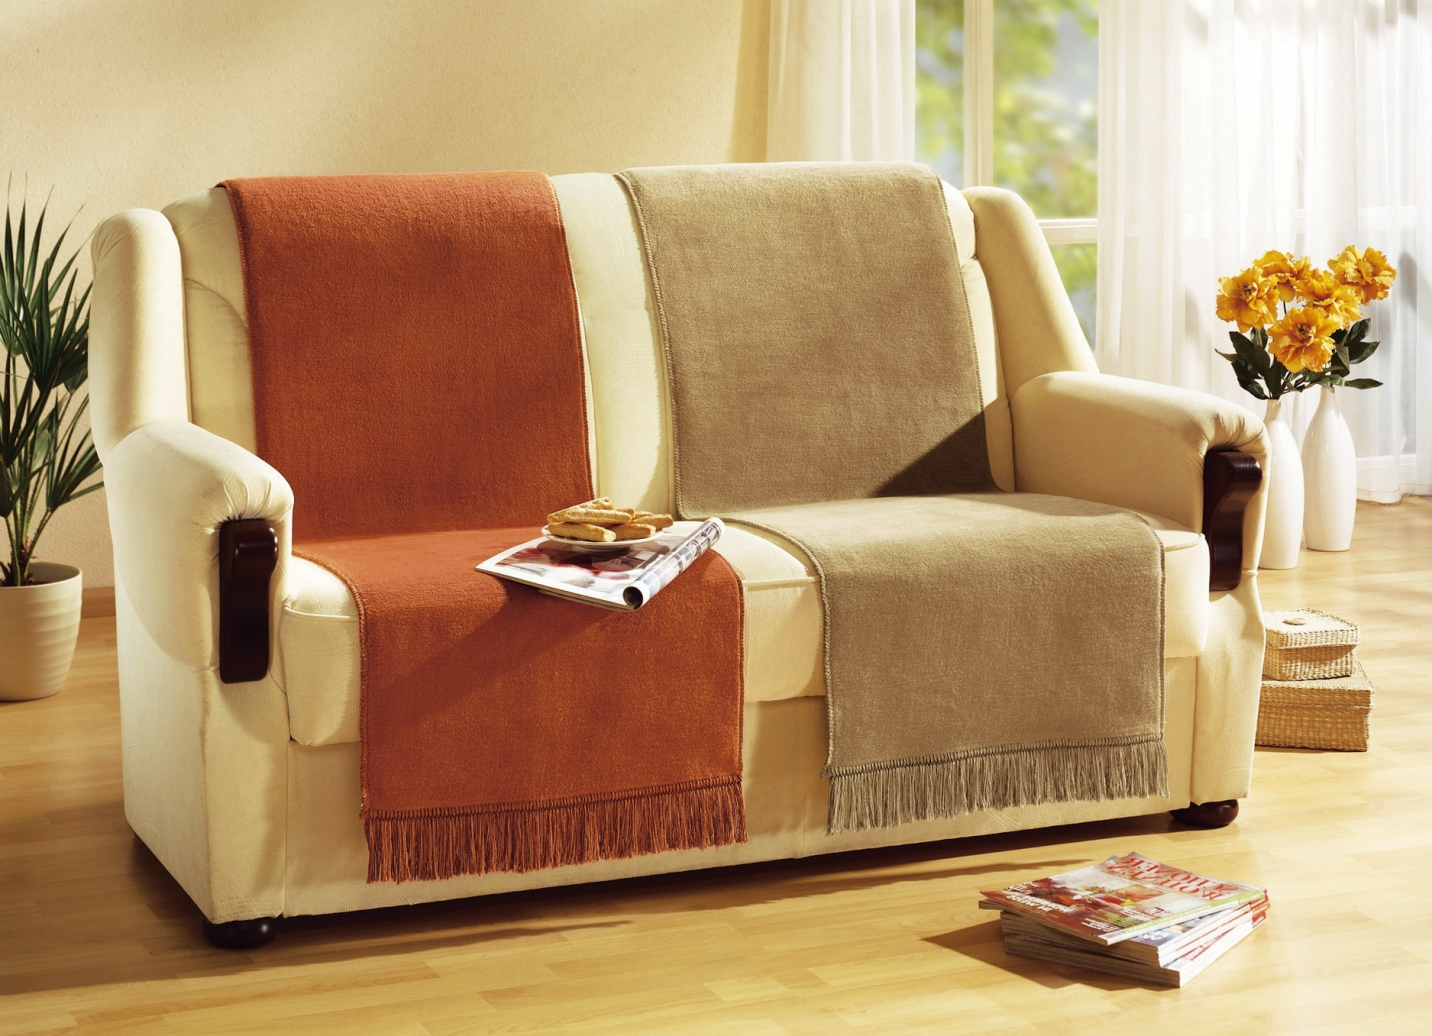 berwrfe sofa excellent hussen sofa esches von mirabeau bild living at home with berwrfe sofa. Black Bedroom Furniture Sets. Home Design Ideas